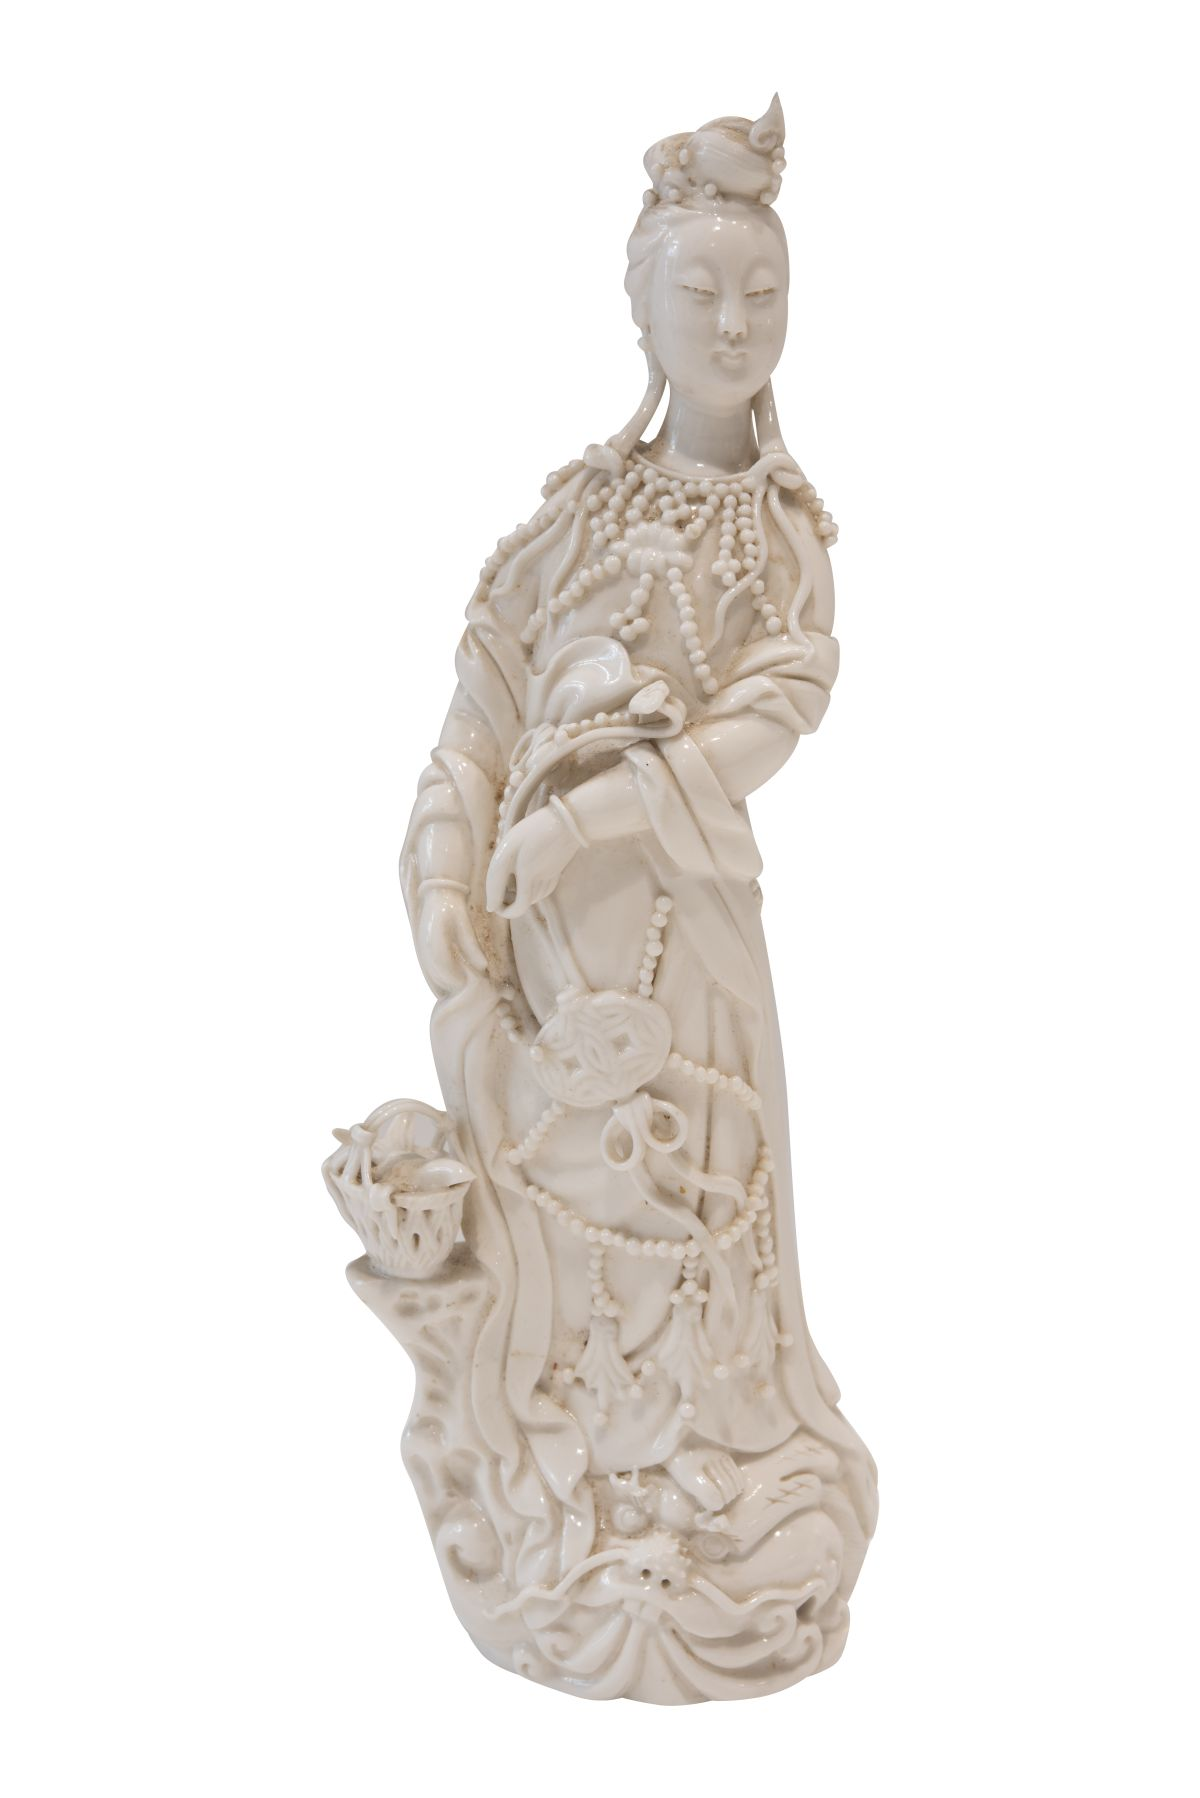 "#65 Blanc de Chine ""Guanyin"", porcelain figure | Blanc de Chine ""Guanyin"", Porzellanfigur Image"